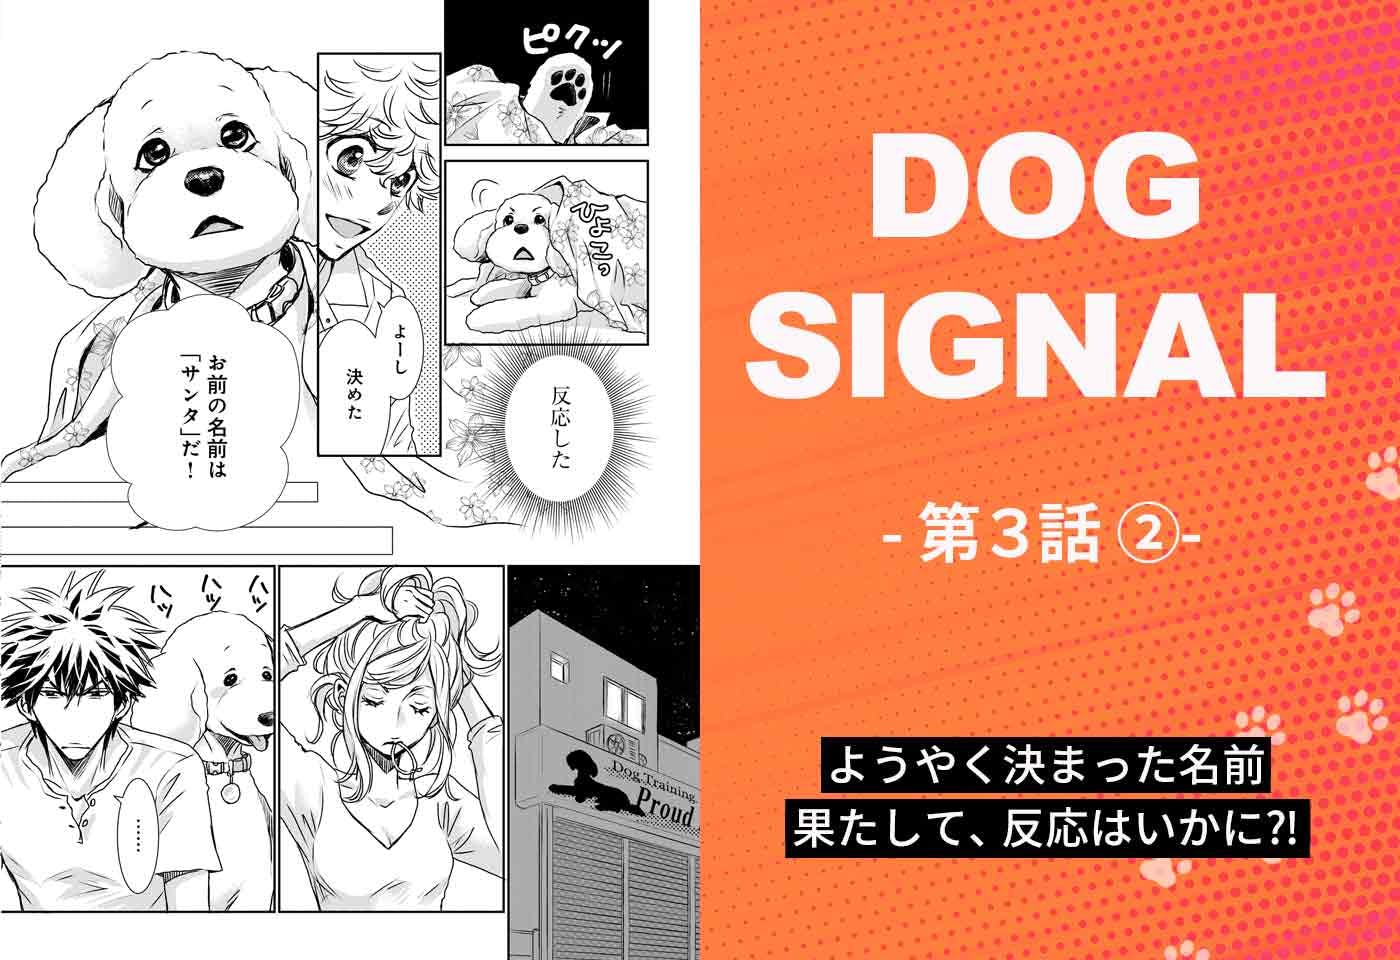 『DOG SIGNAL』3話目 2/4